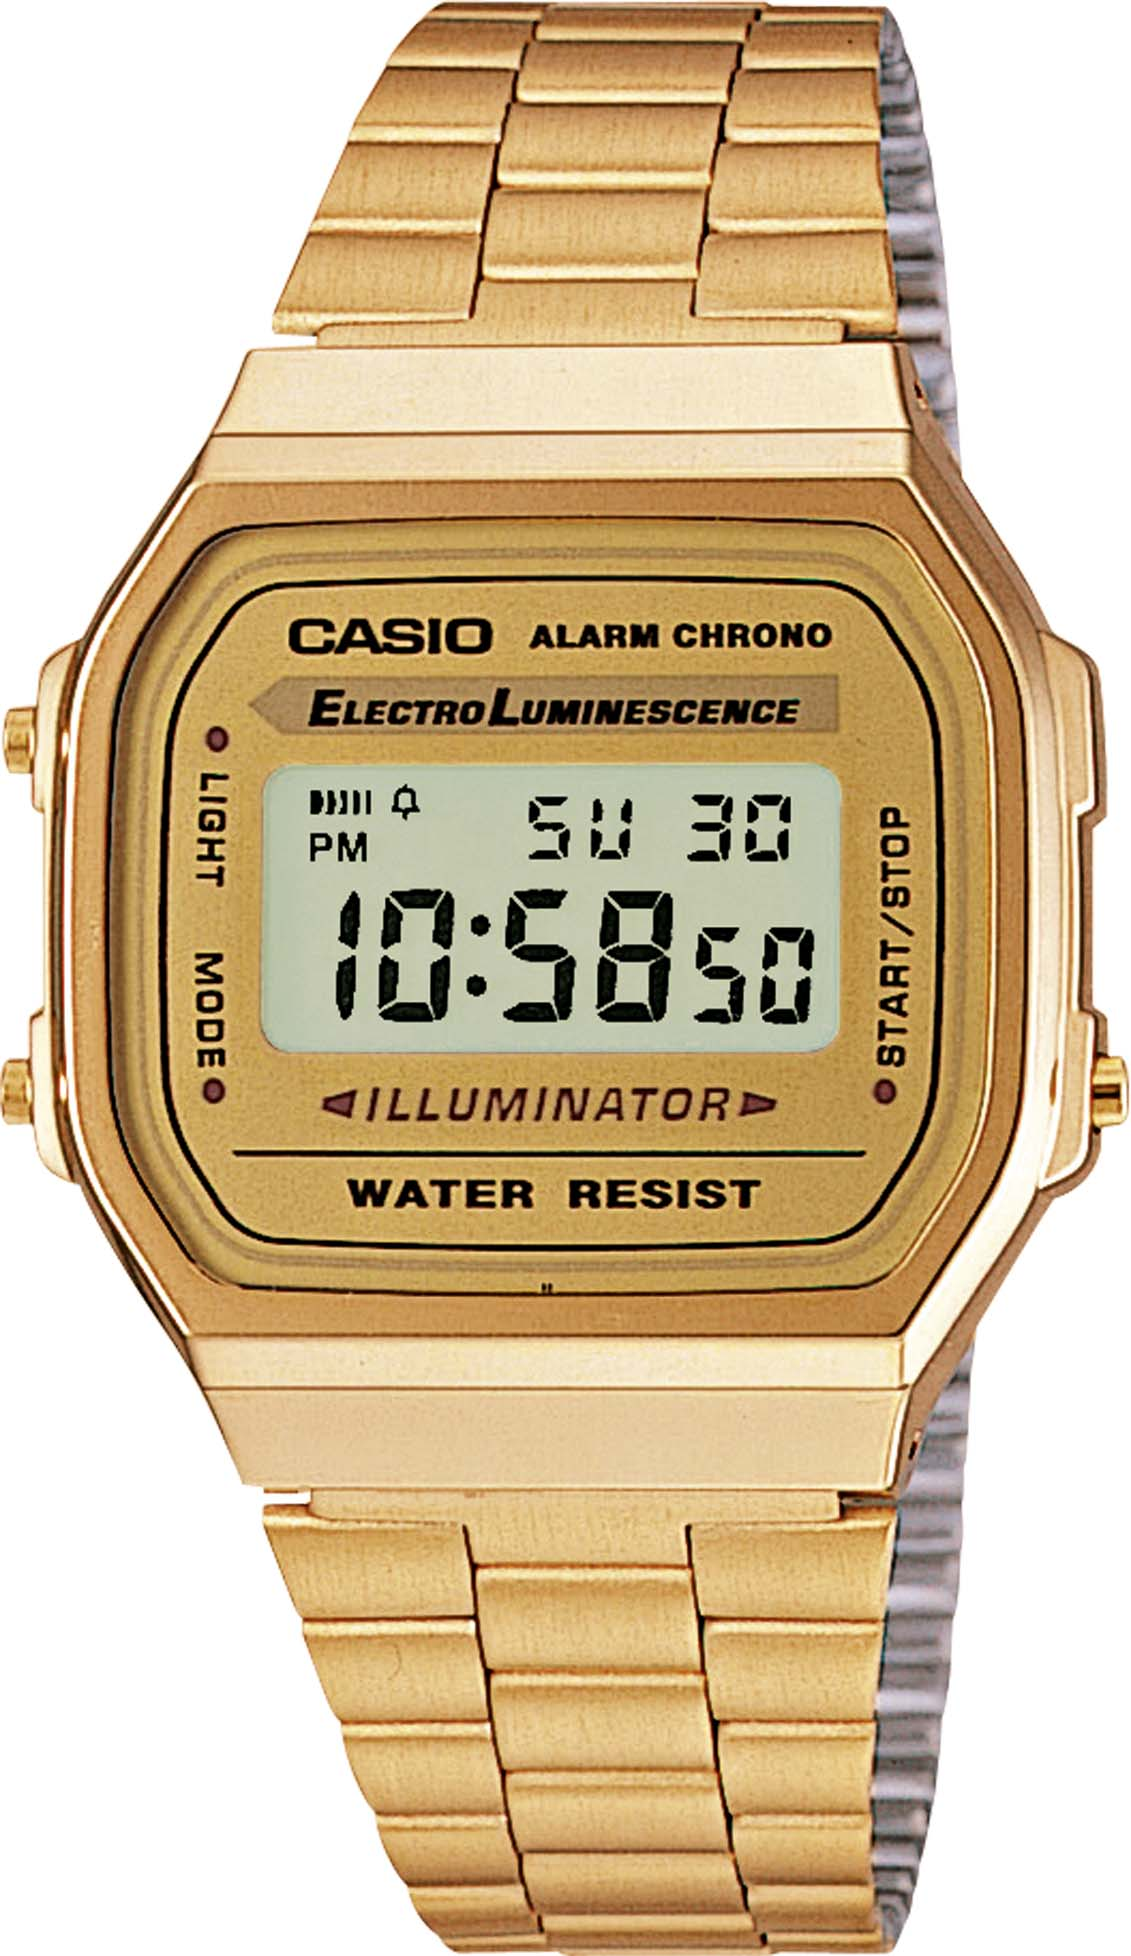 CASIO A168WG-9EF Quazwerk, Digital ionisiertes Armband Edelstahl gelb vergoldet 38 x 36 x 10 mm 364965000